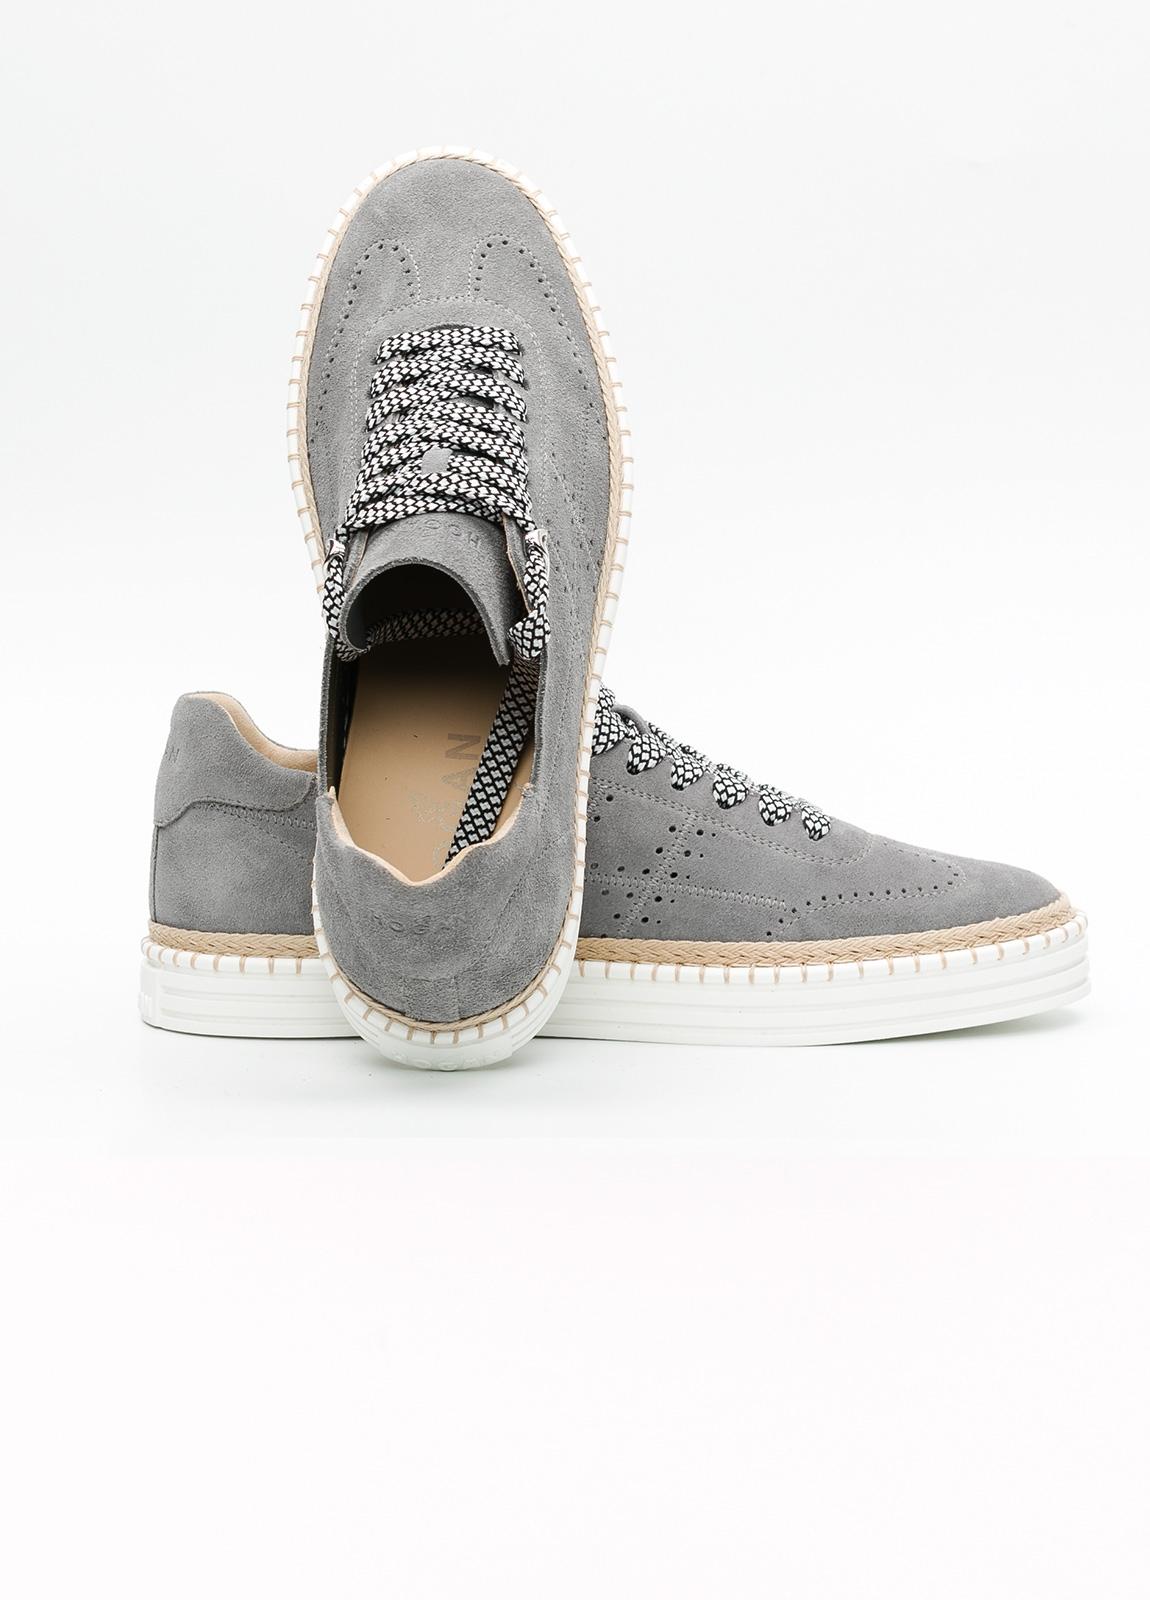 Calzado sport hombre R260 color gris. 100% Serraje. - Ítem4